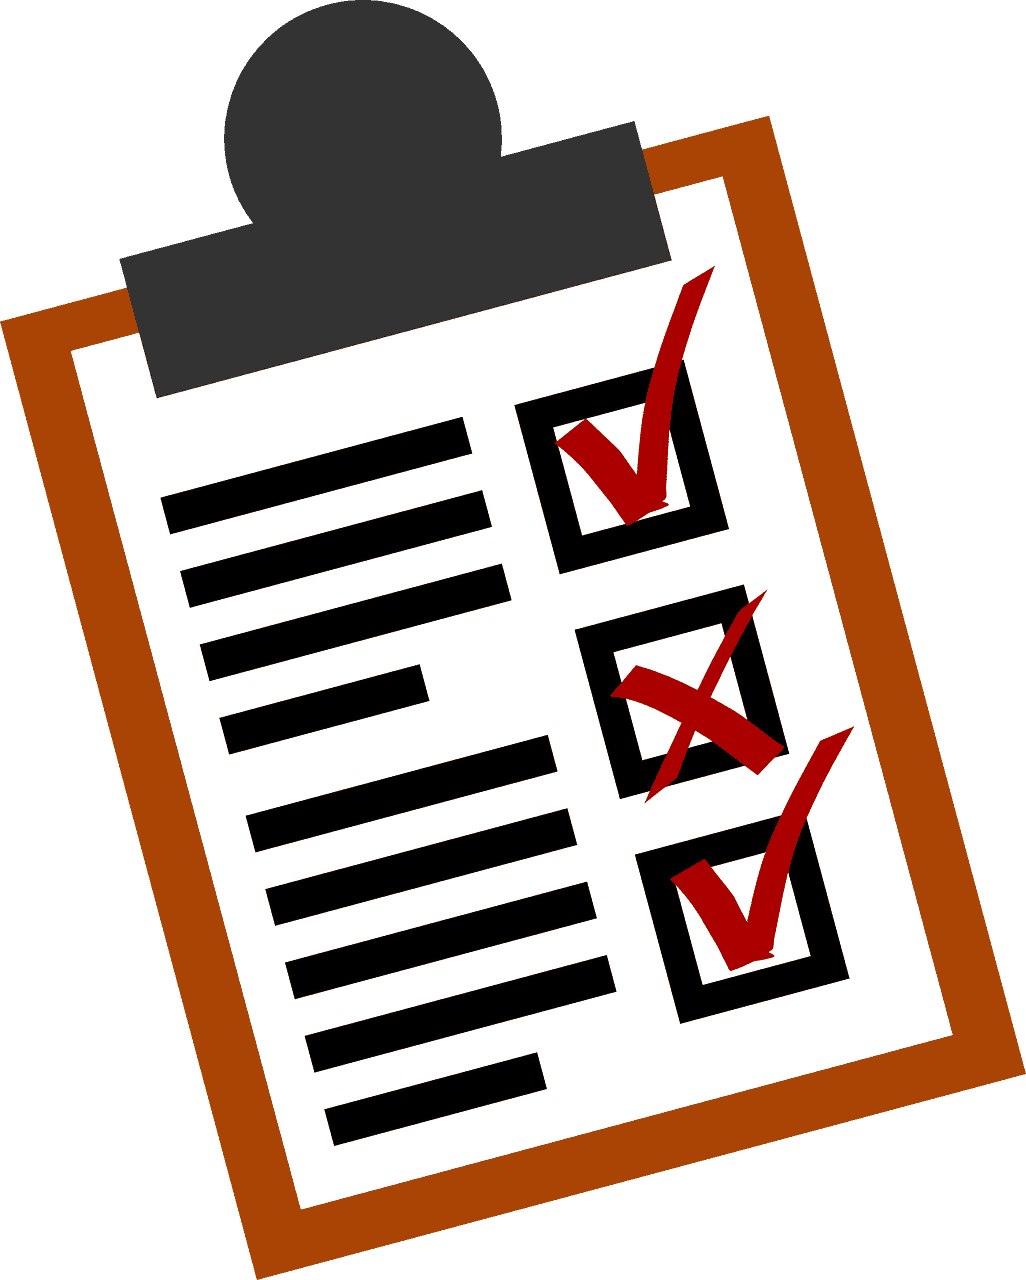 survey checklist-41335_1280 pixebay no attribution required - ALIGN